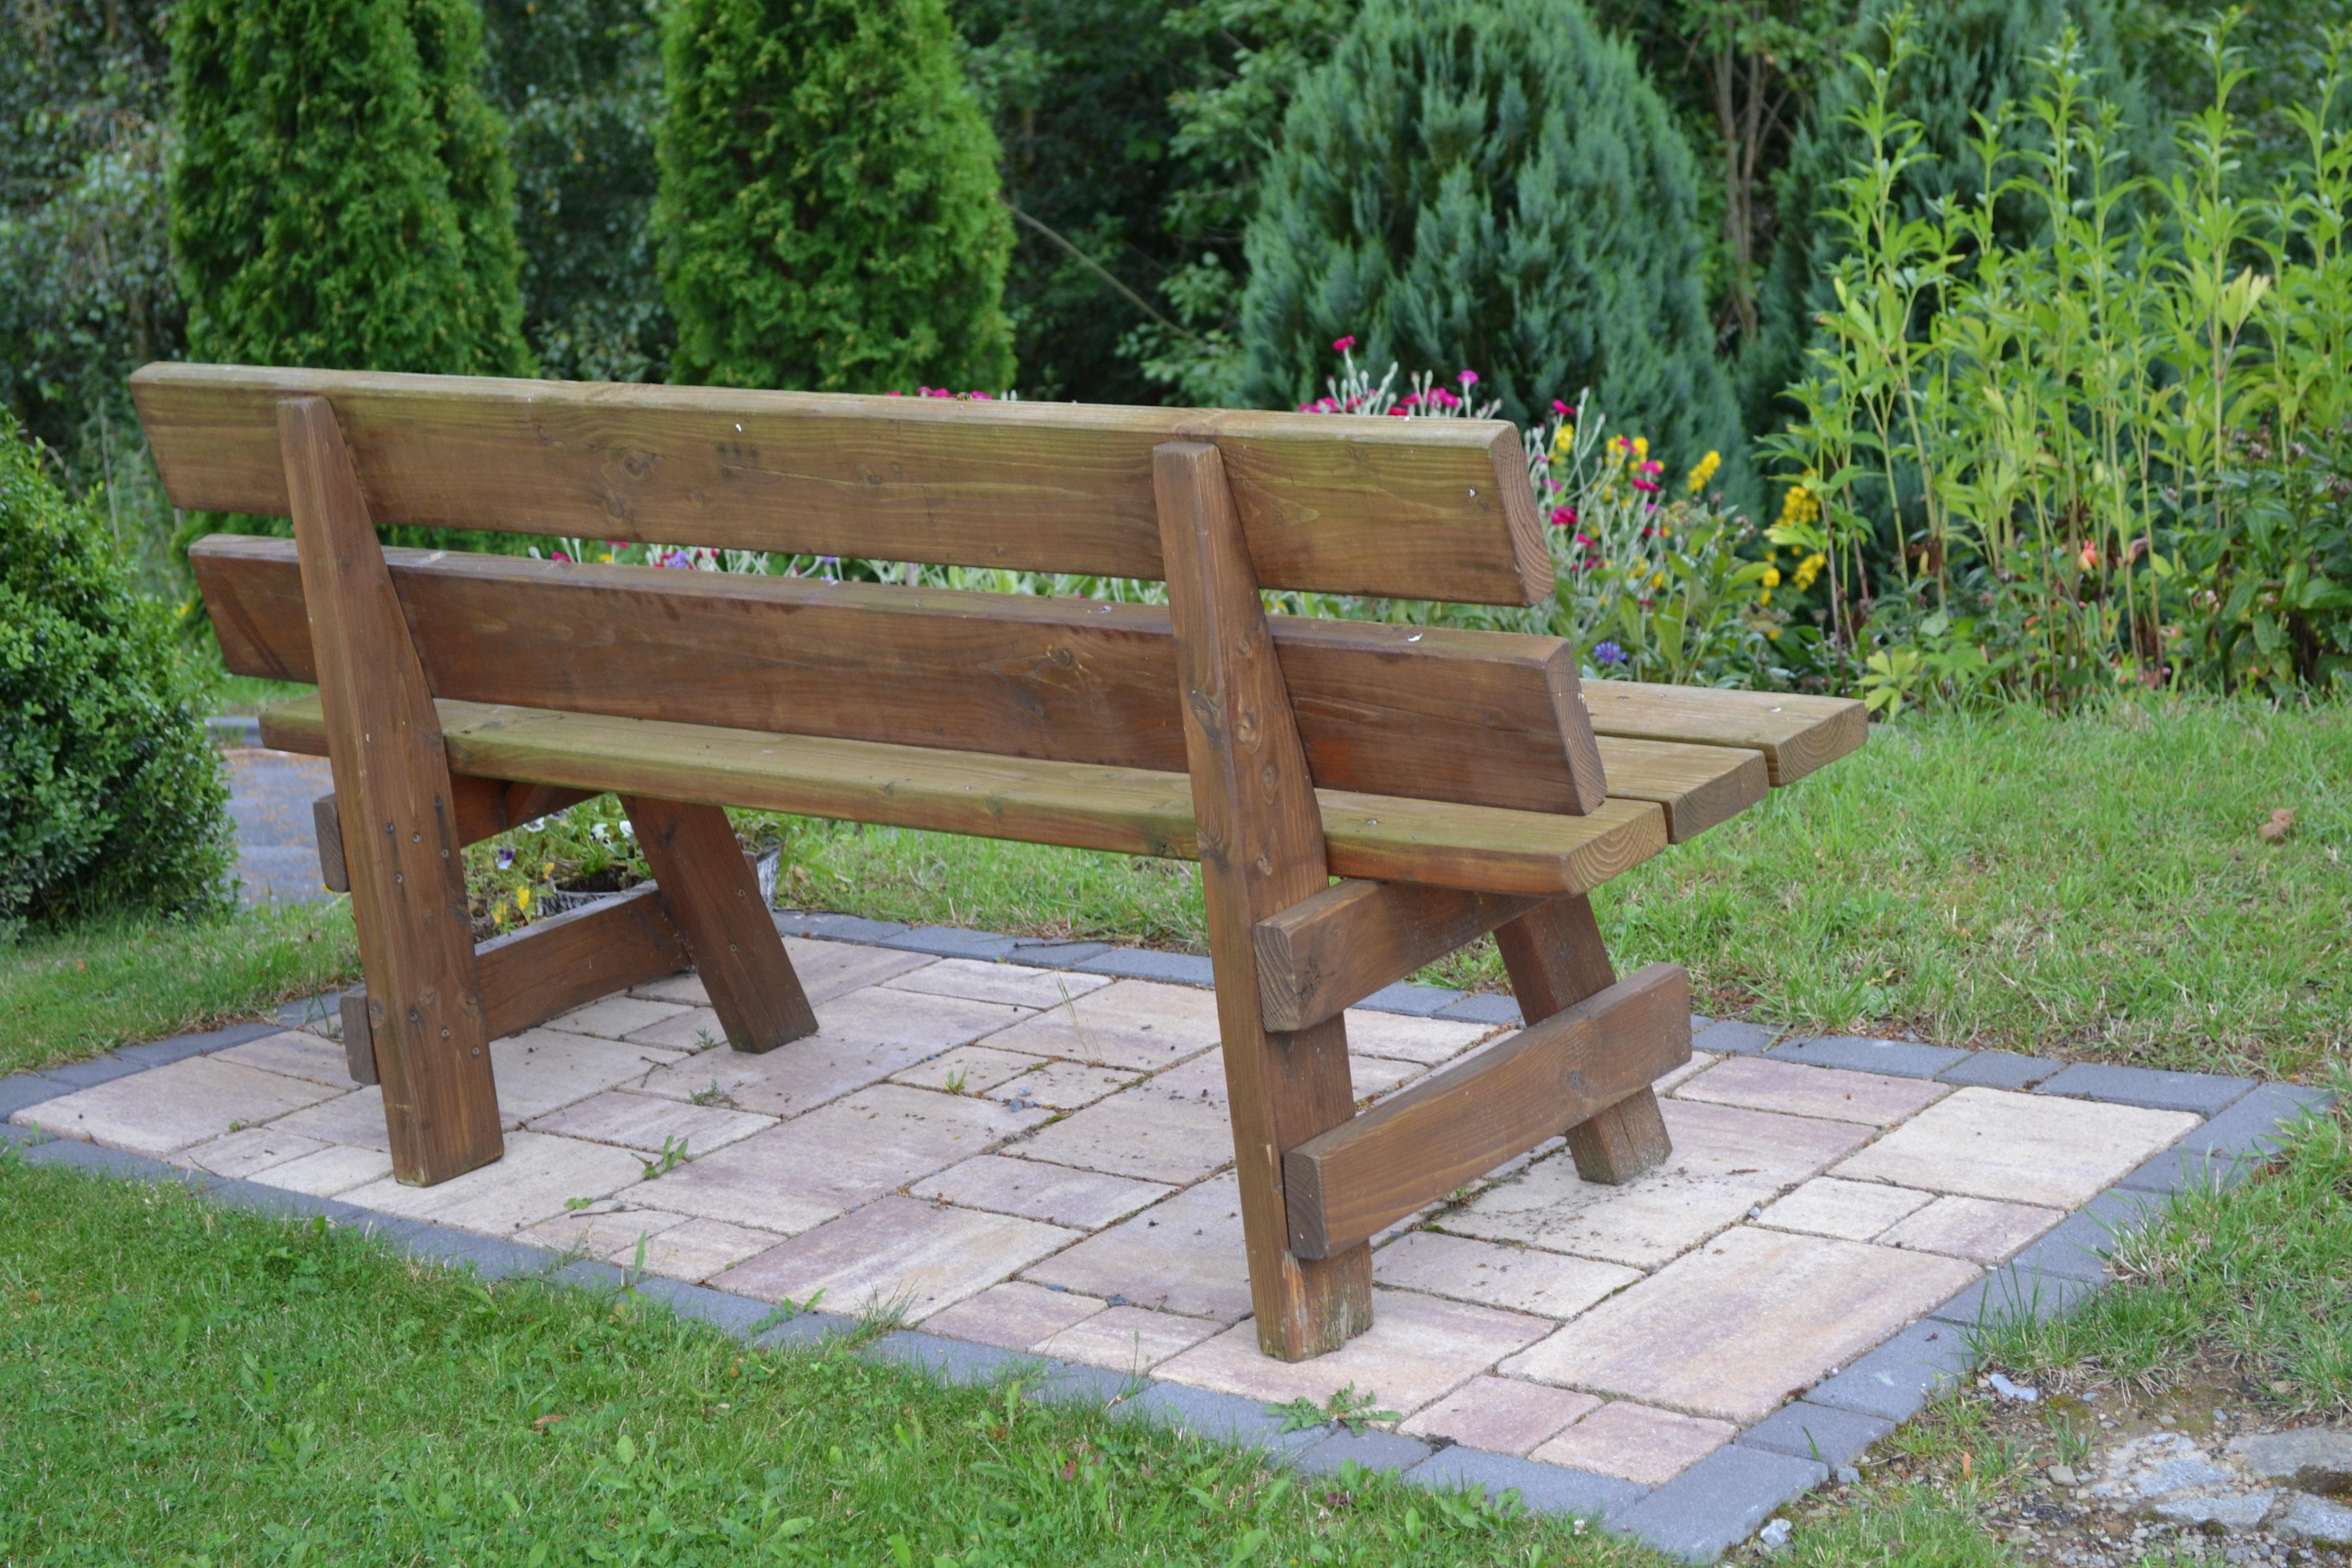 Fotos gratis : mesa, naturaleza, banco, patio interior, jardín ...